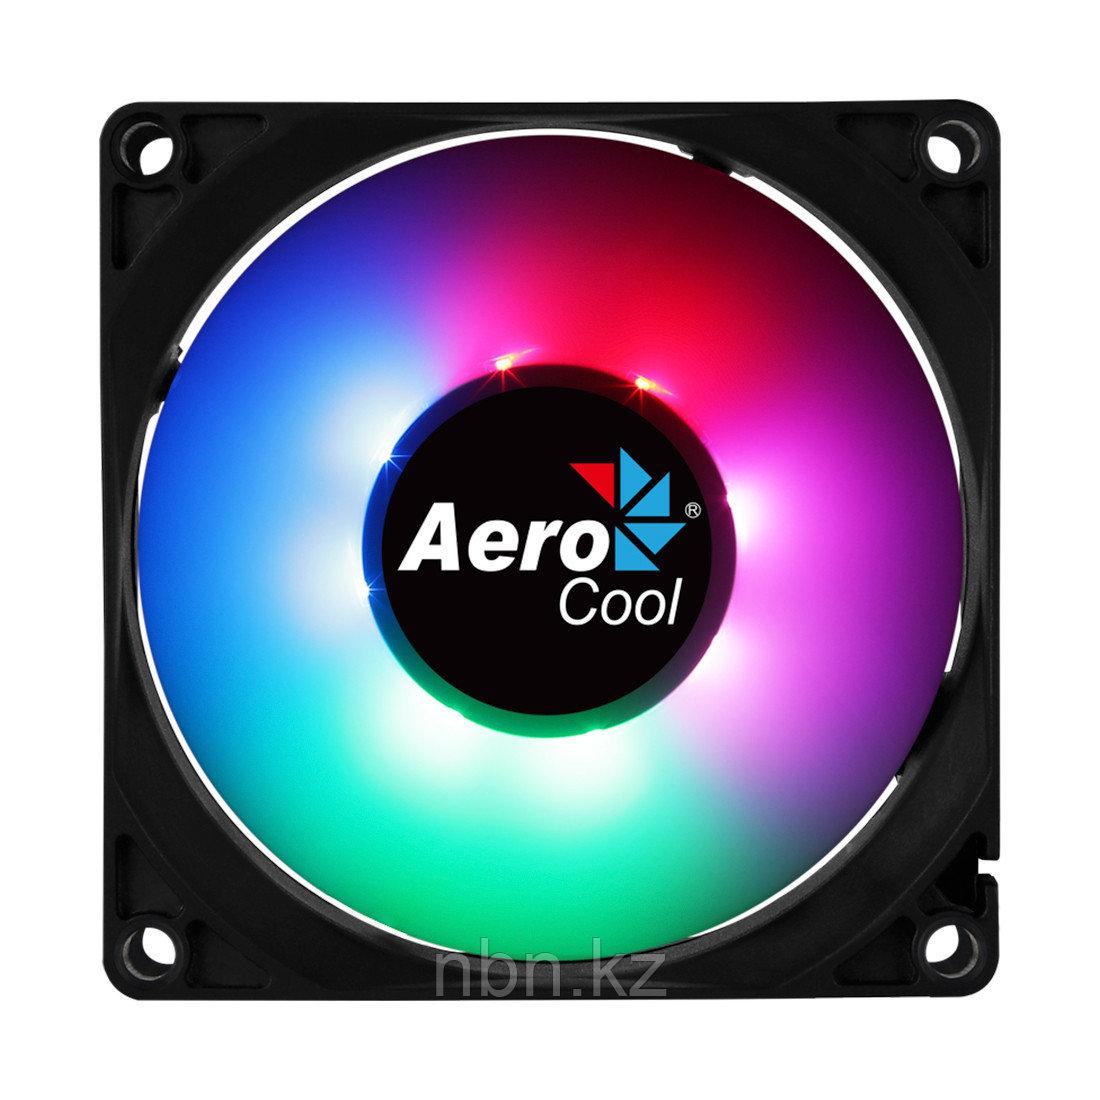 Кулер для компьютерного корпуса AeroCool Frost 14